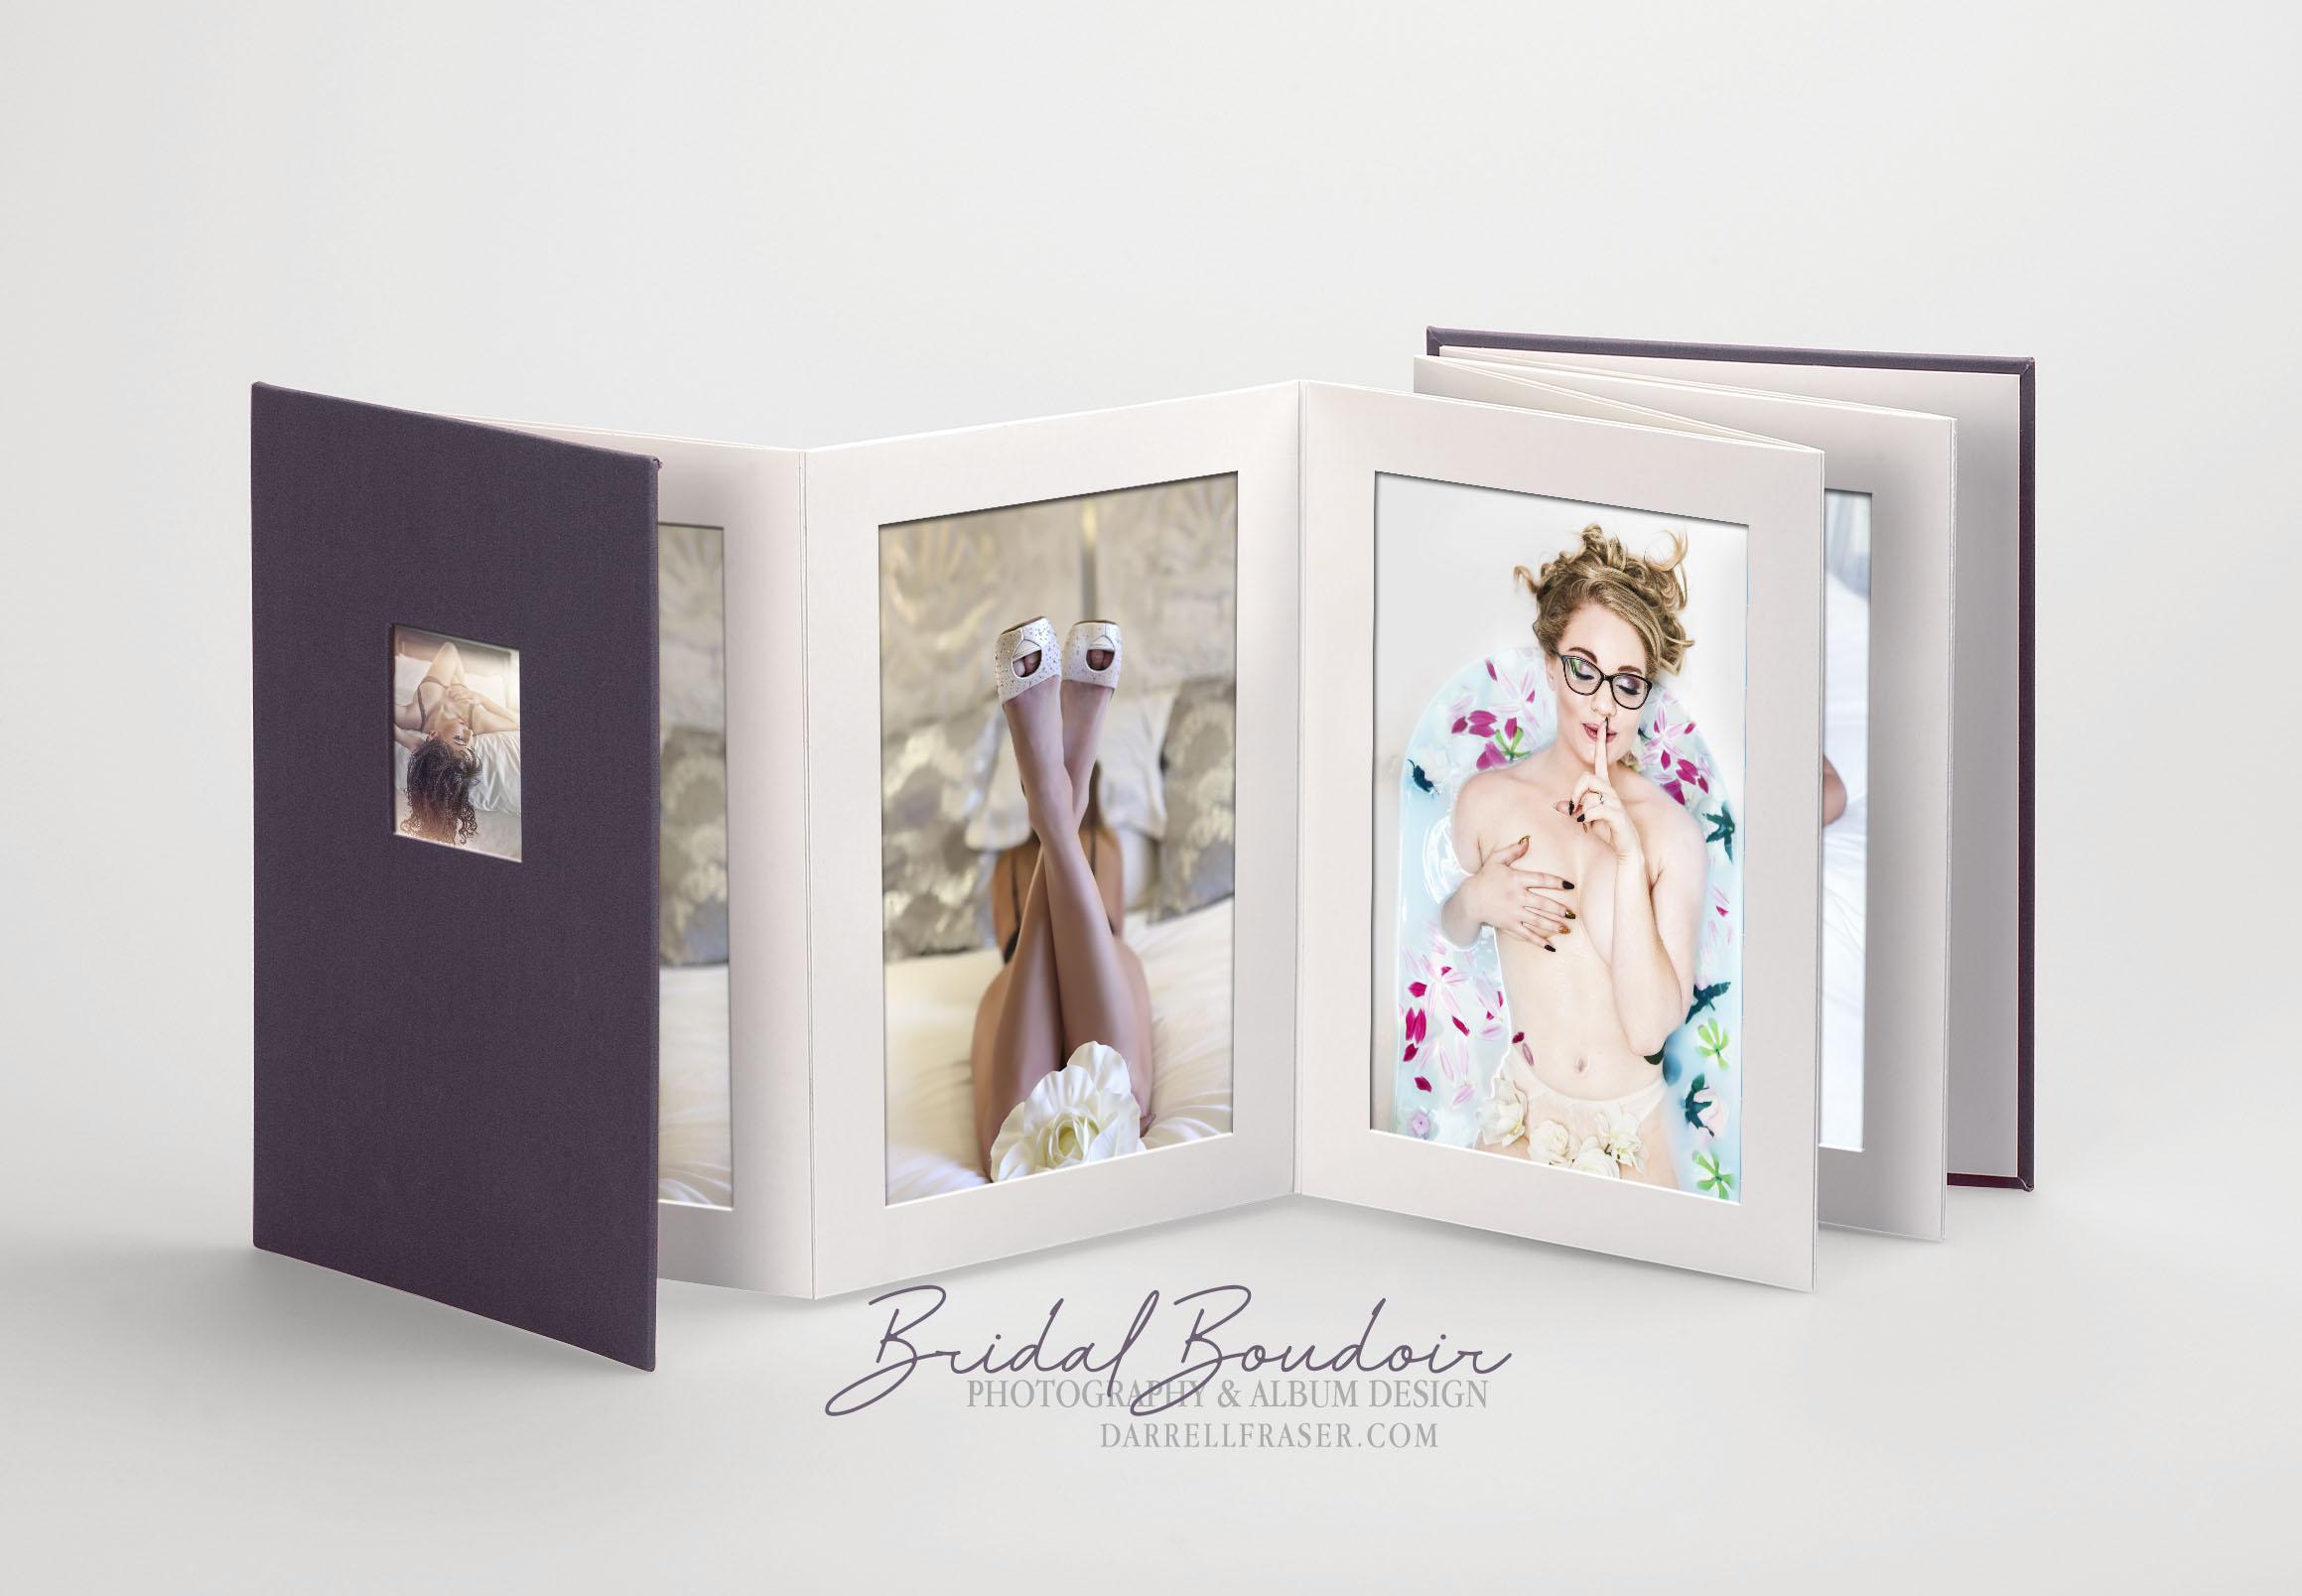 Darrell Fraser Boudoir Photography and Album Designs